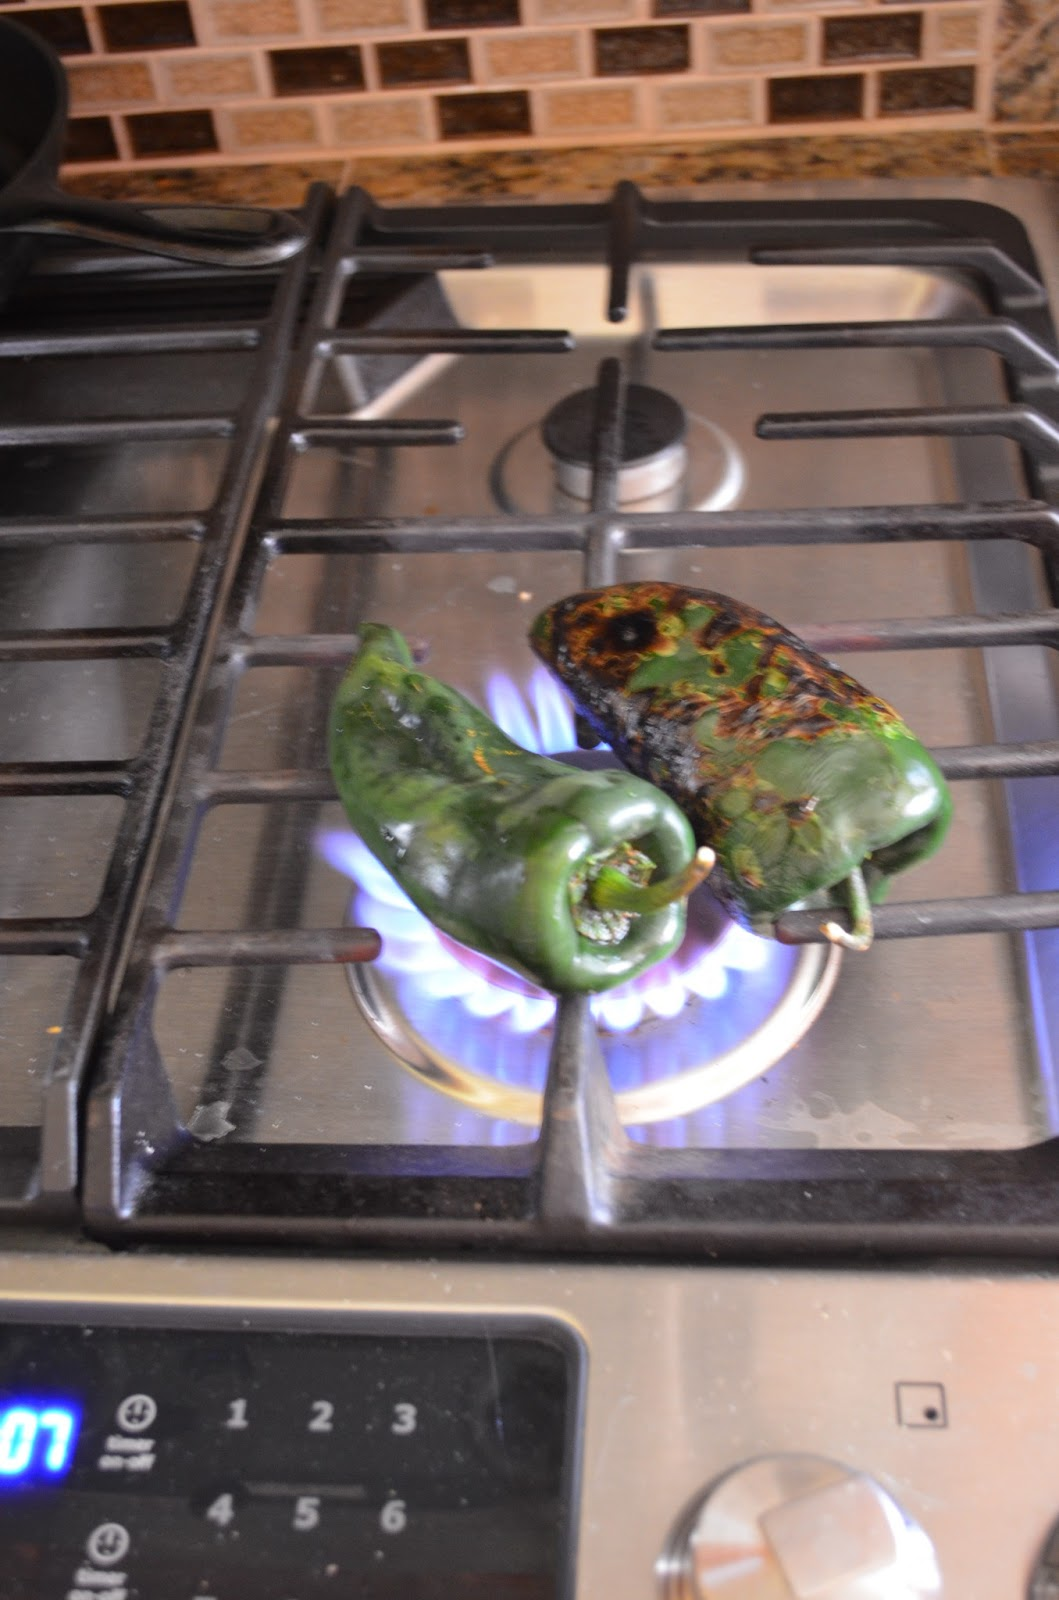 Chicken-Chili-Verde-With-Avocado-Poblano-Chili.jpg